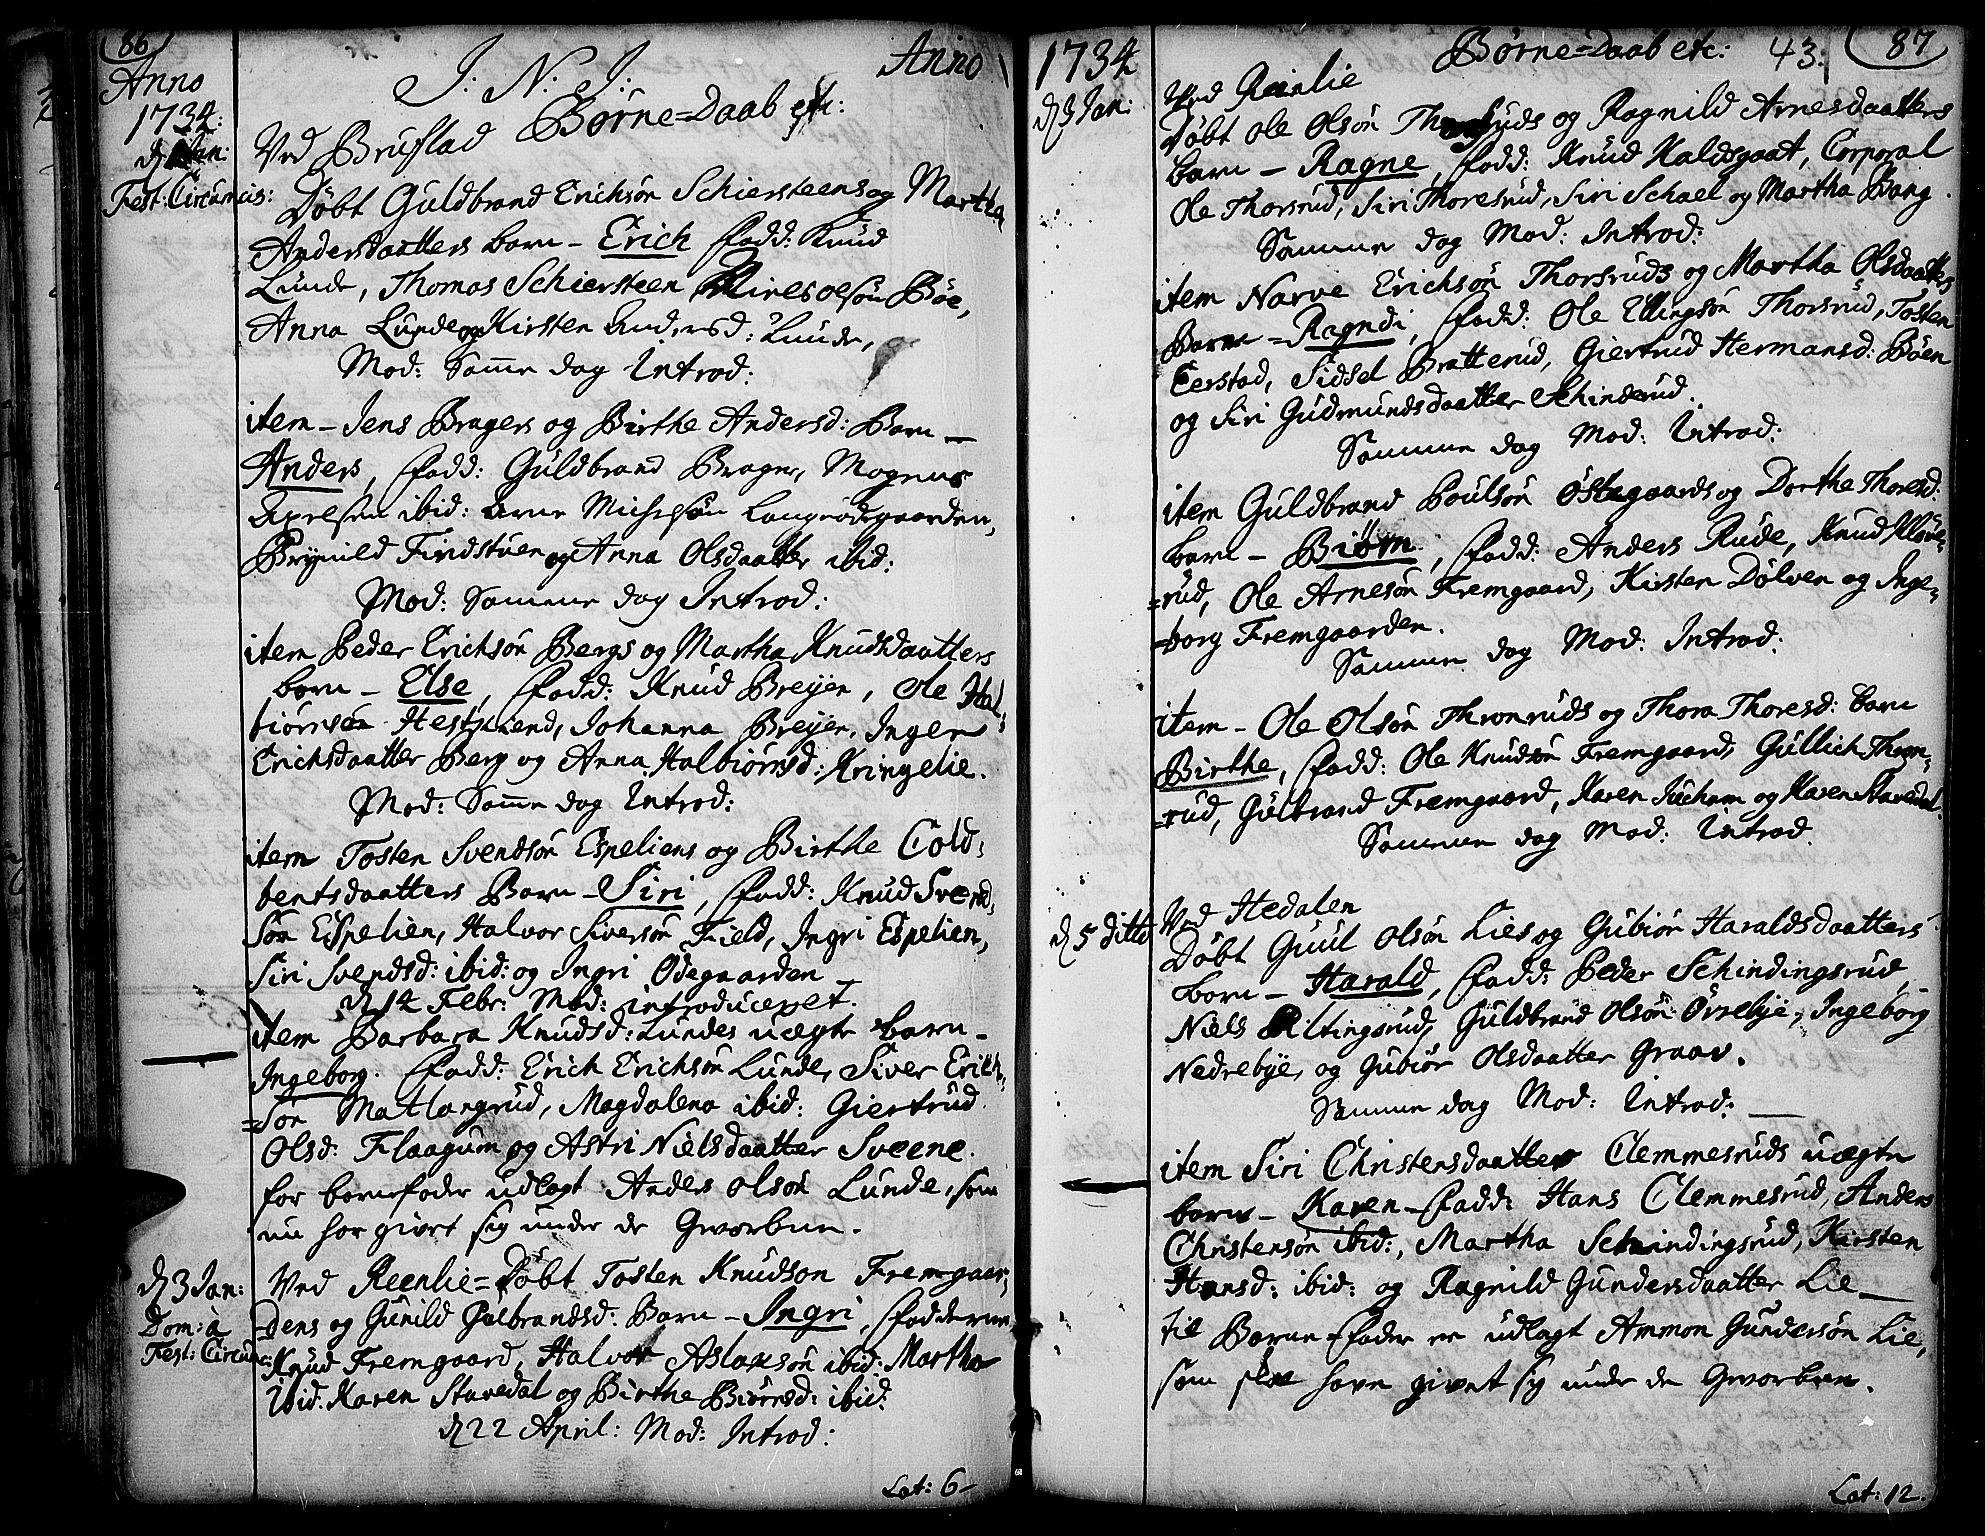 SAH, Aurdal prestekontor, Ministerialbok nr. 4, 1730-1762, s. 86-87